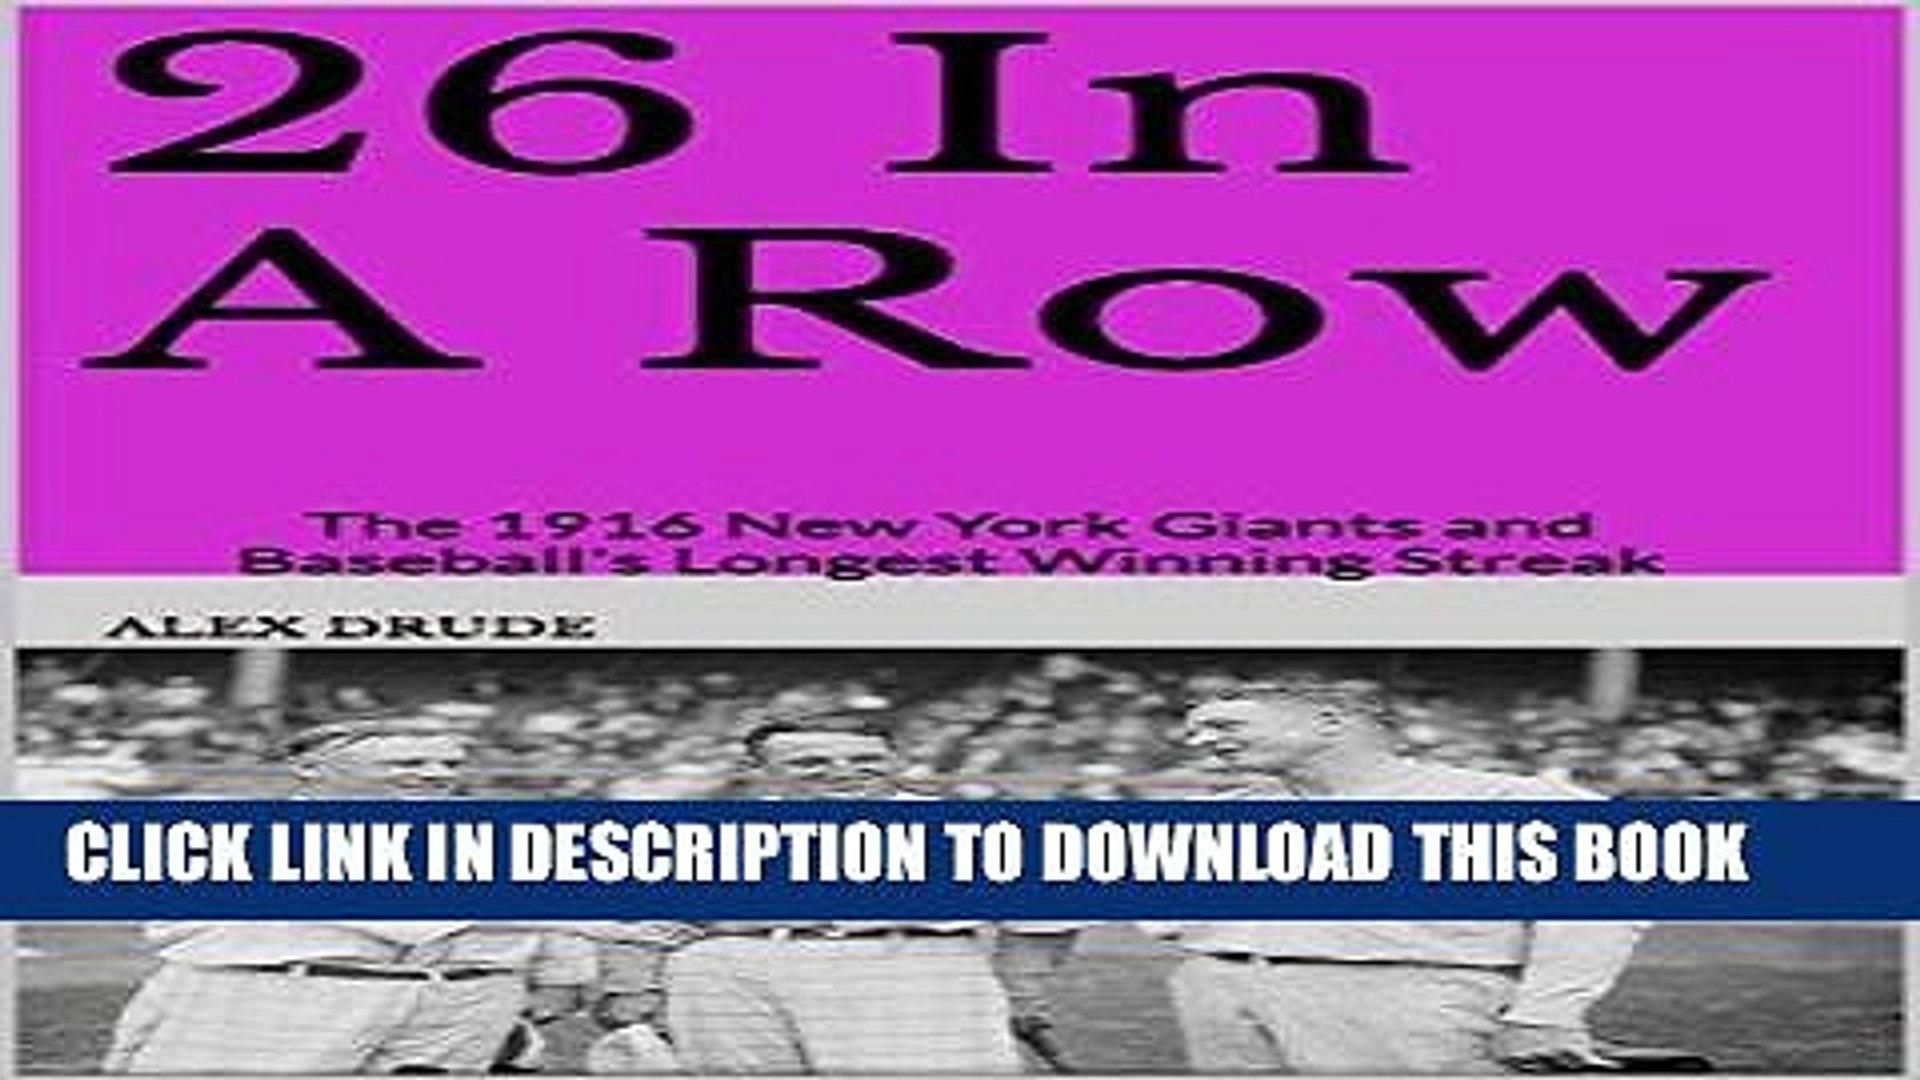 [PDF] 26 In A Row: The 1916 New York Giants and Baseball s Longest Winning Streak Full Online